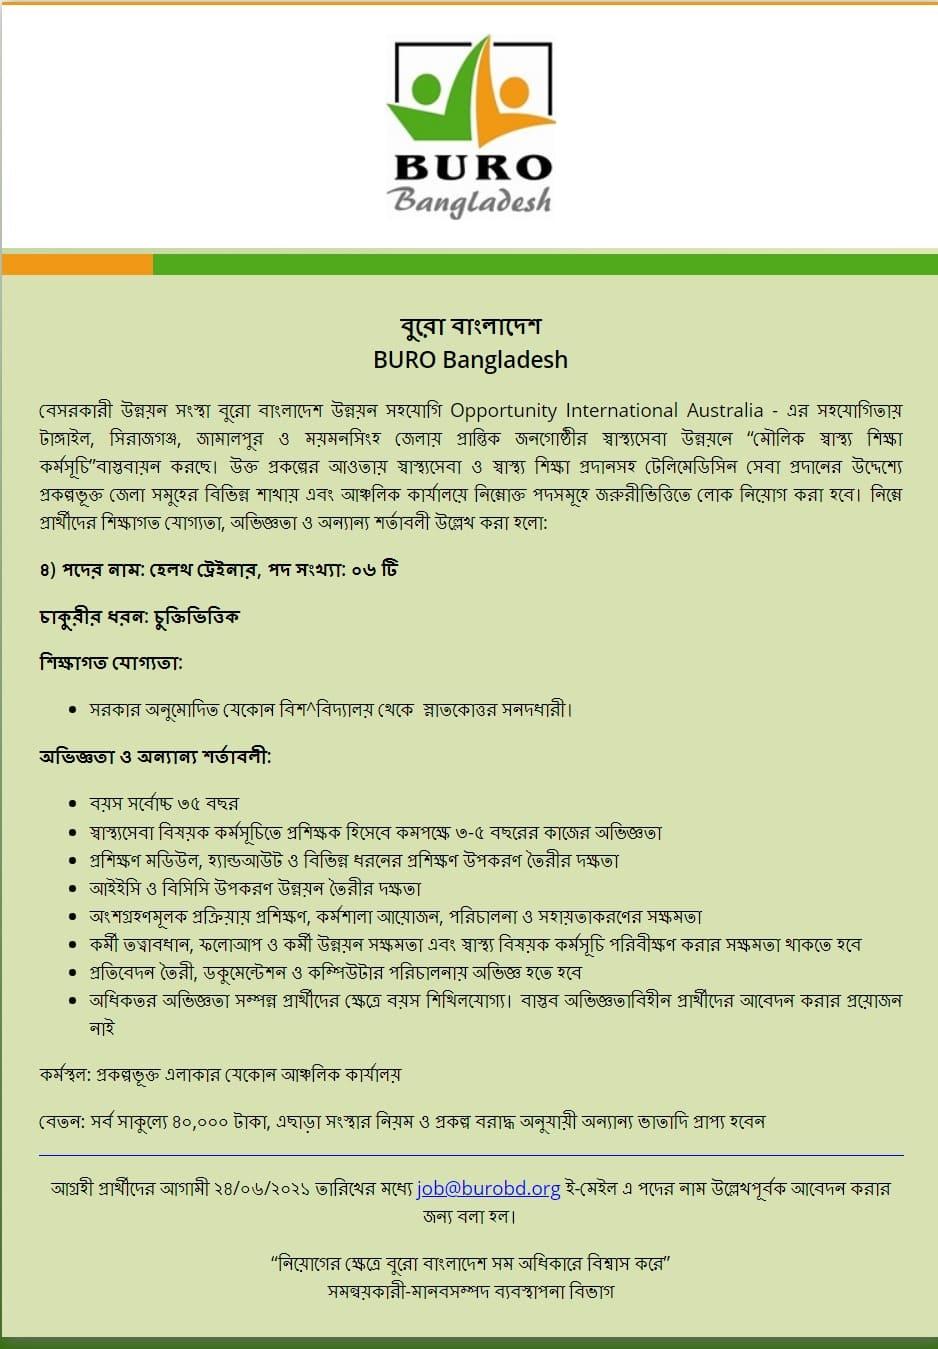 BURO Bangladesh Job Circular 2021